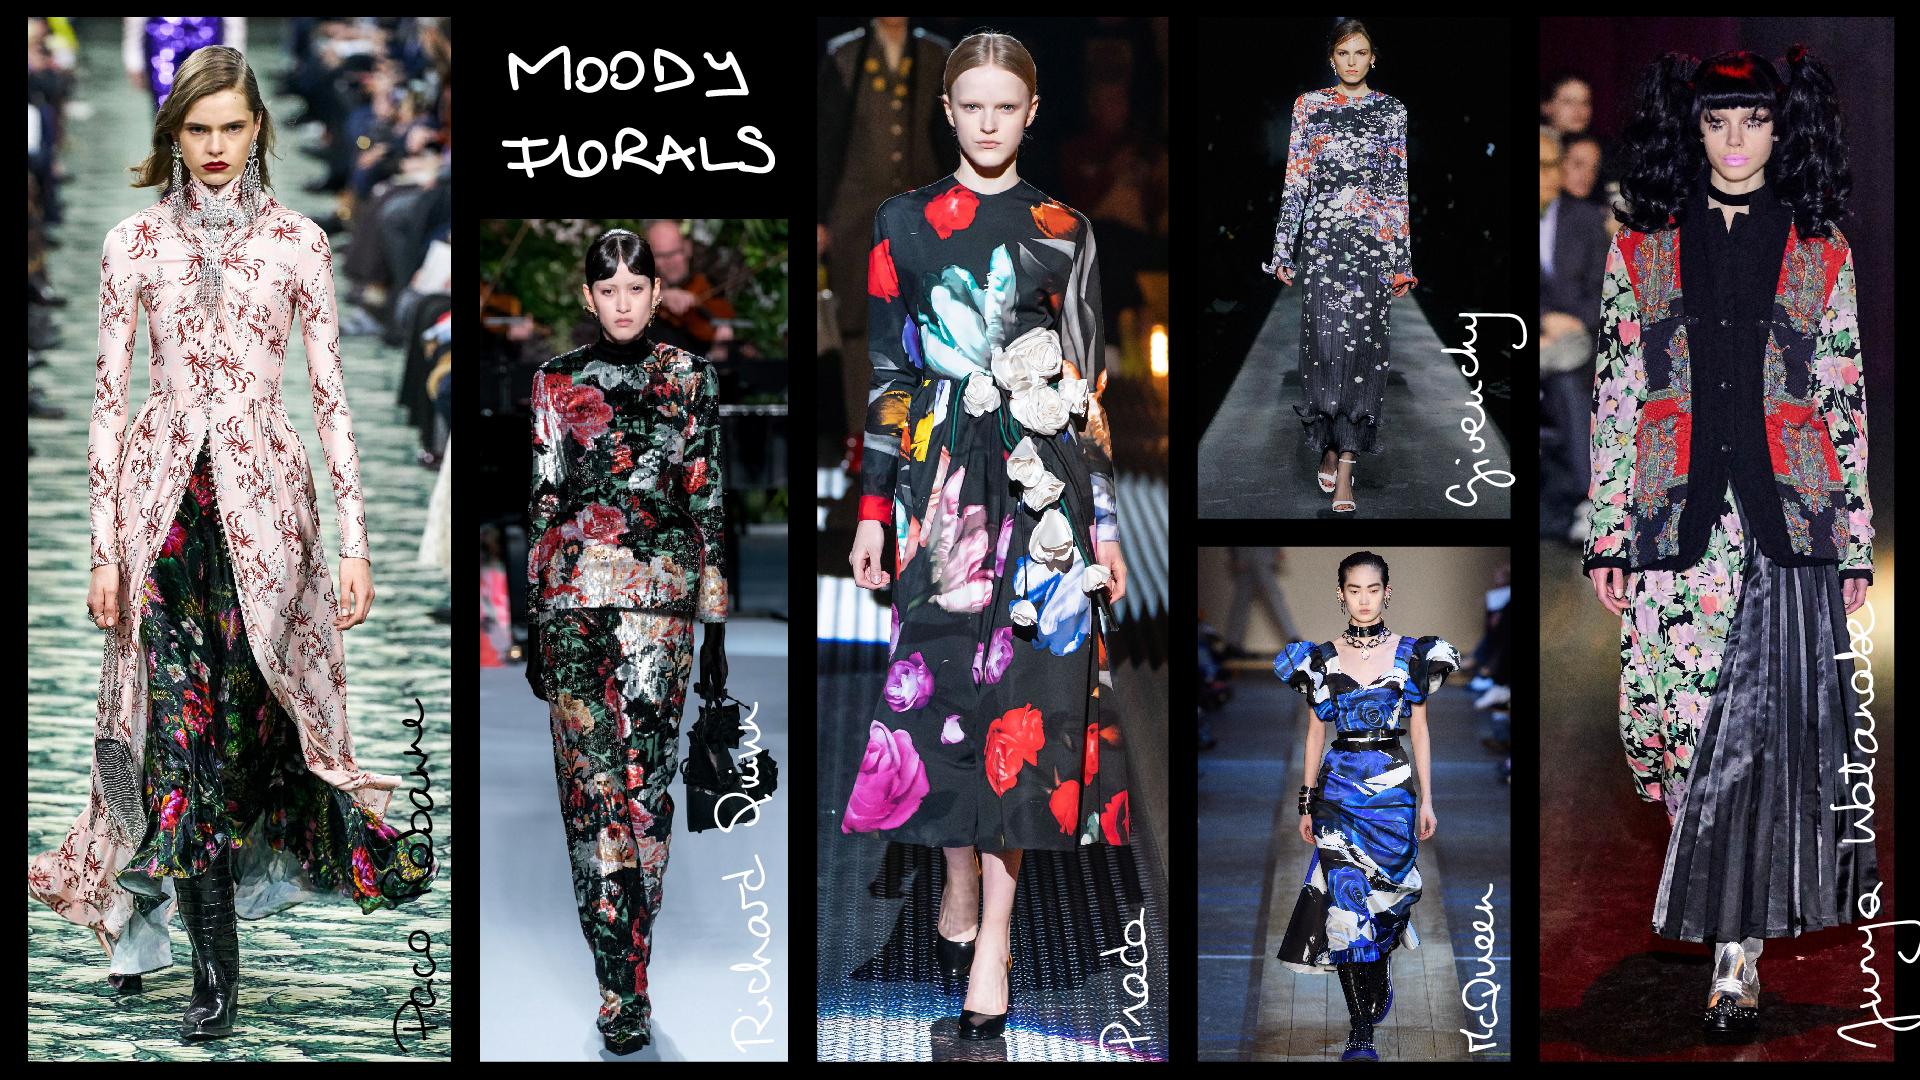 Justine-Leconte_fashion-trends-fall-winter-2019_boards-05.jpg